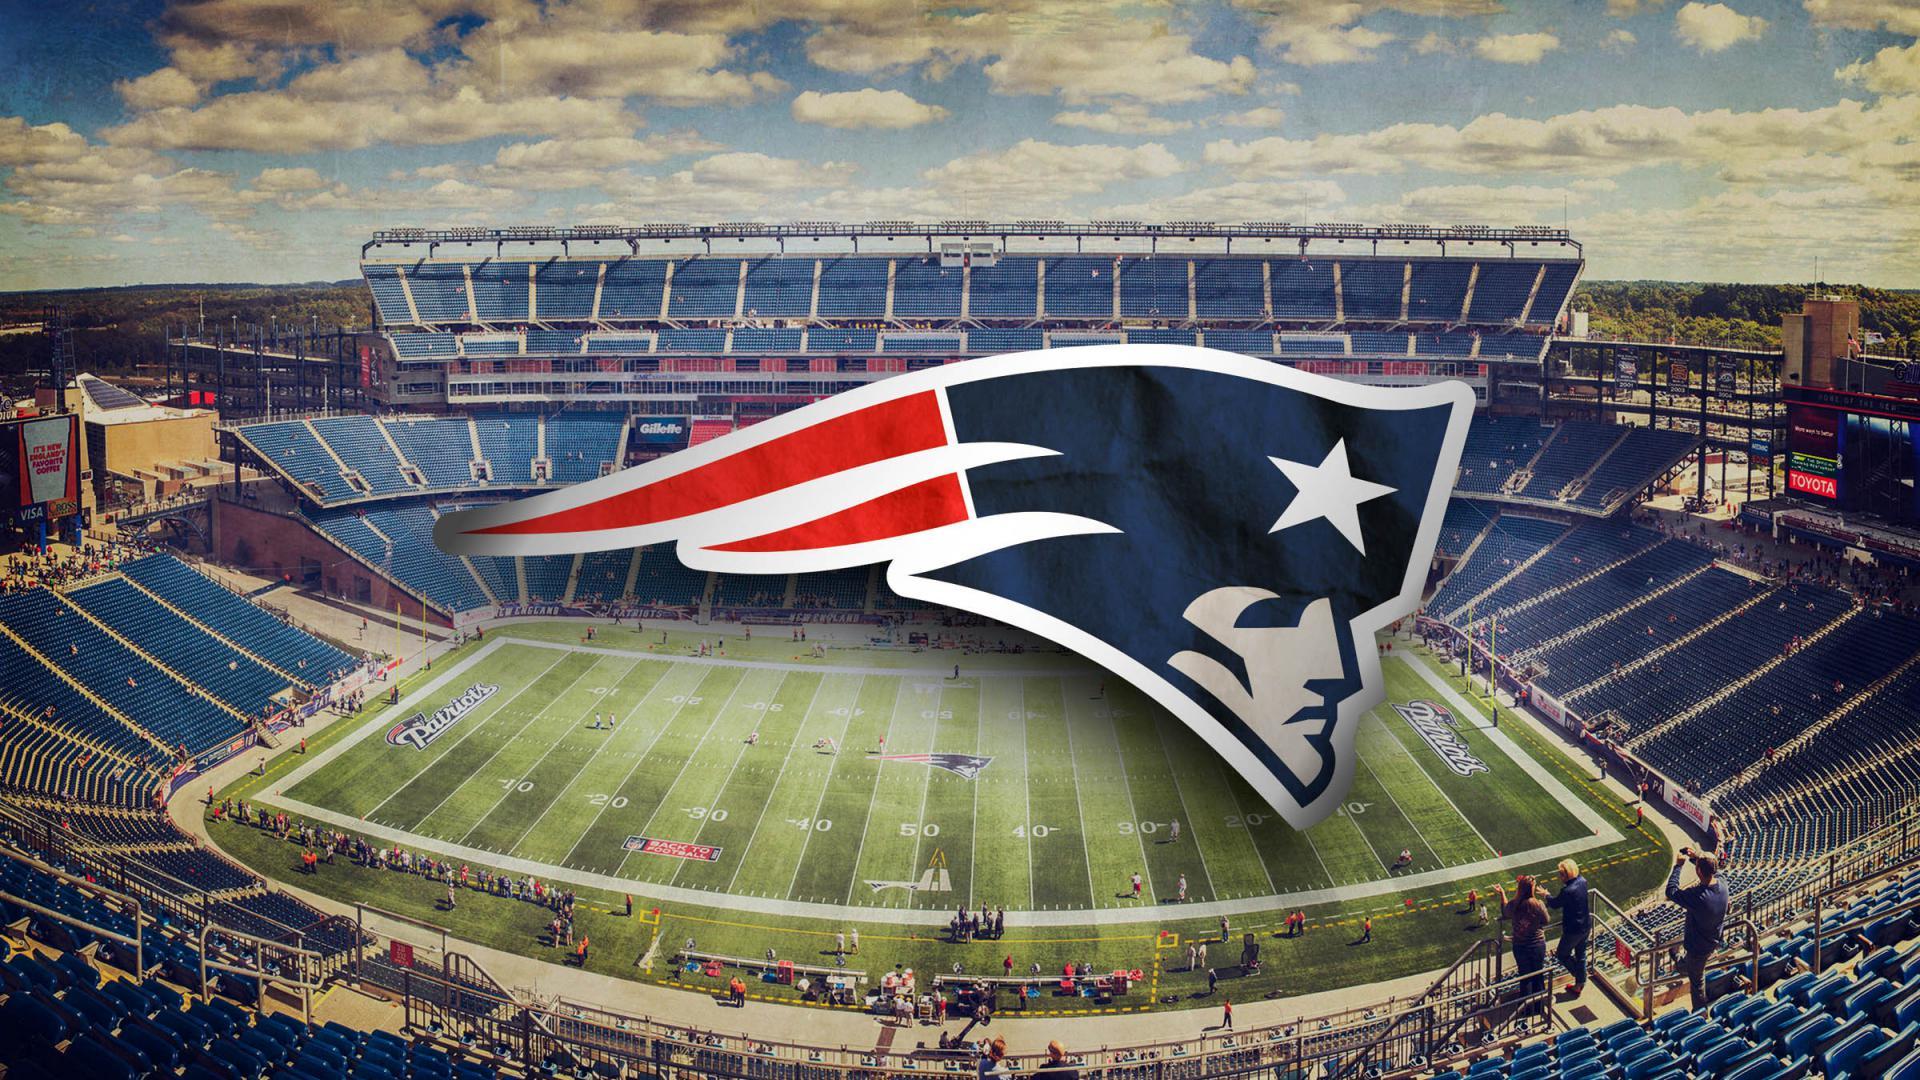 New England Patriots Wallpaper   Logo and Stadium Photo HD 1920x1080